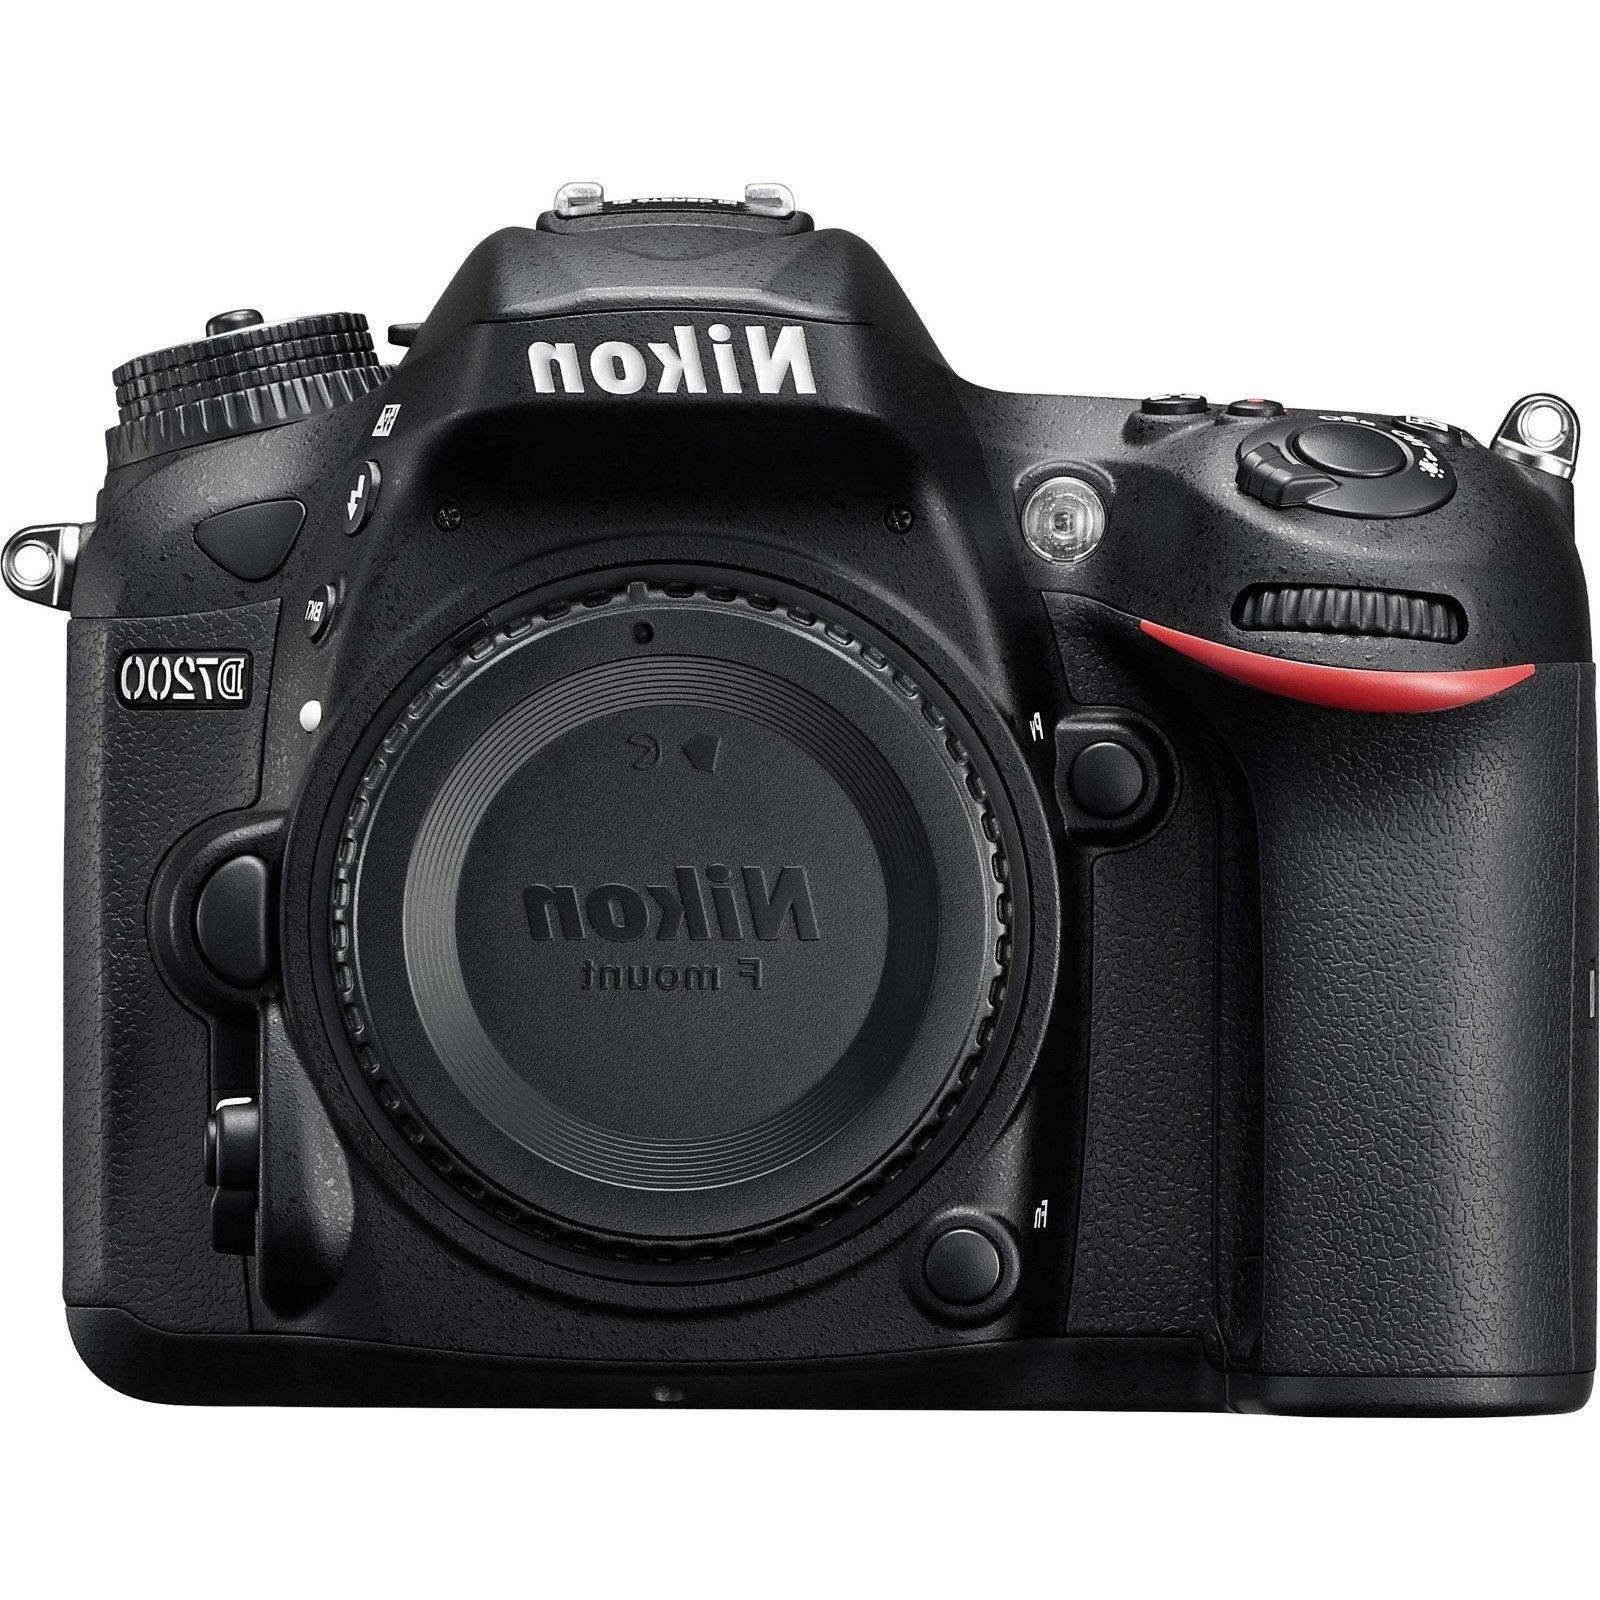 Nikon D7200 24.2MP Black DSLR Camera Body Only